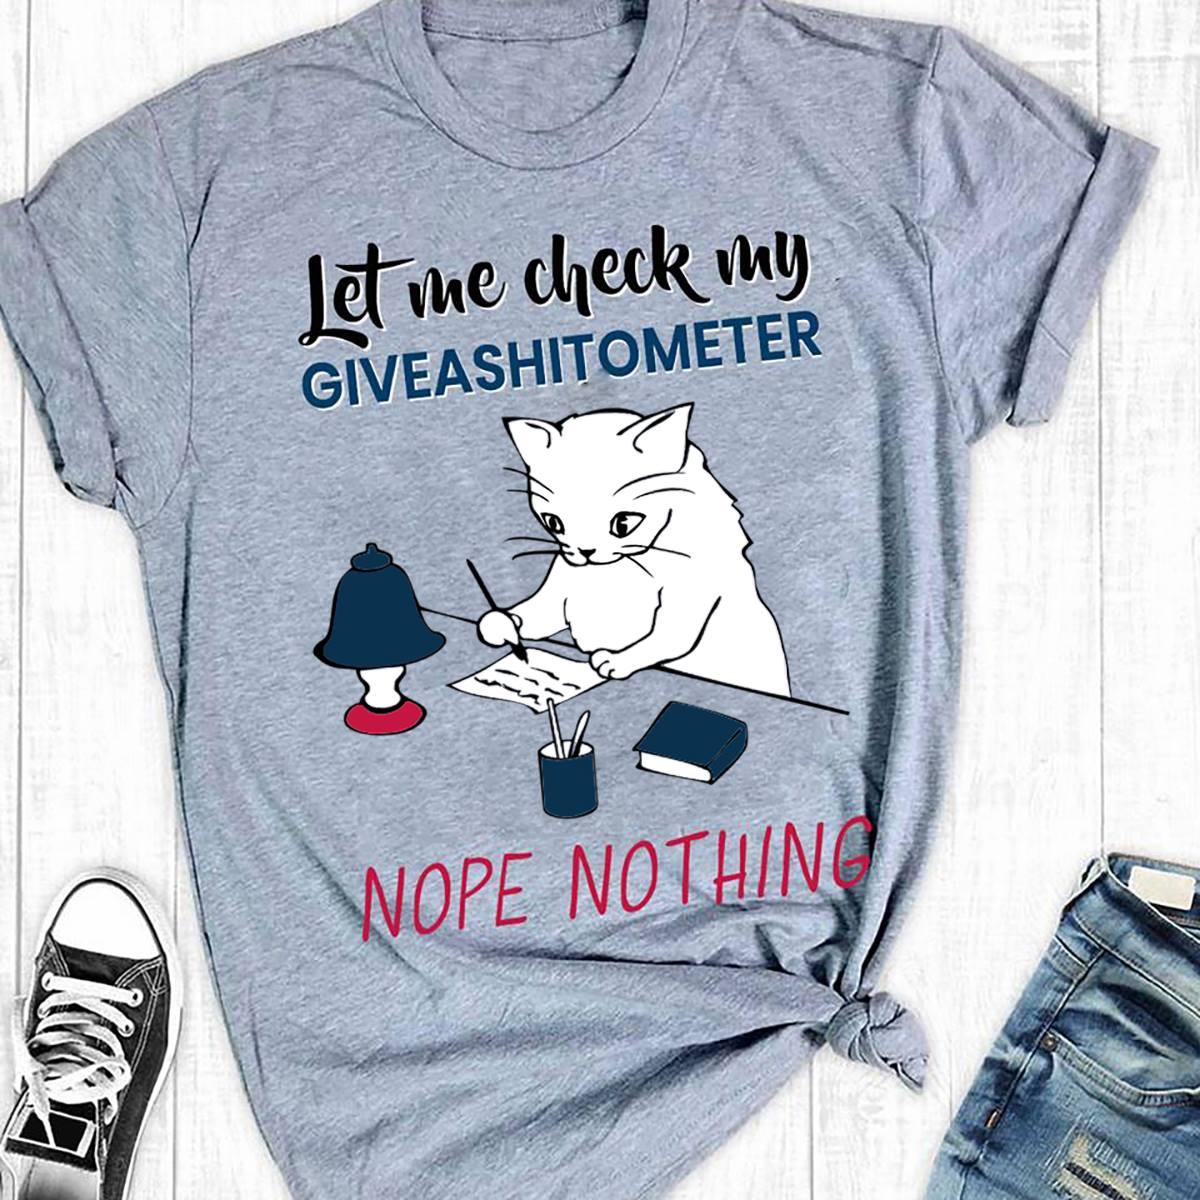 Funny Cat Shirt Check My Giveashitometer Nope Nothing